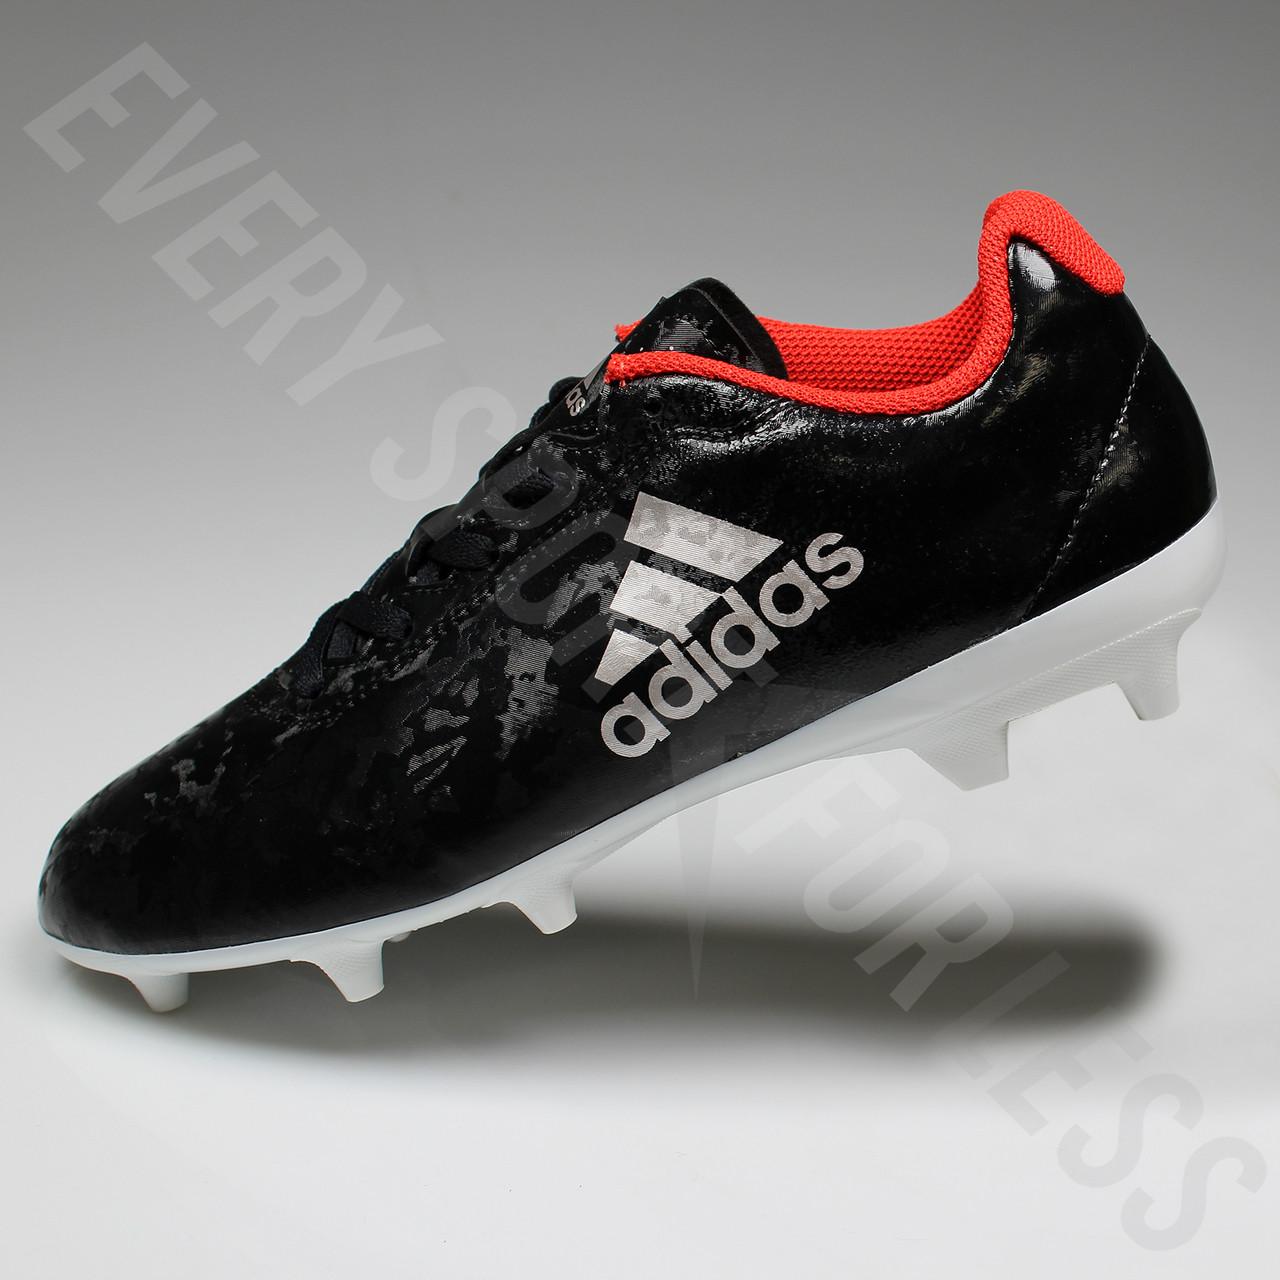 588e5c131 ... Adidas X 17.4 FG Women's Soccer Cleats BA8564 - Black, White, ...